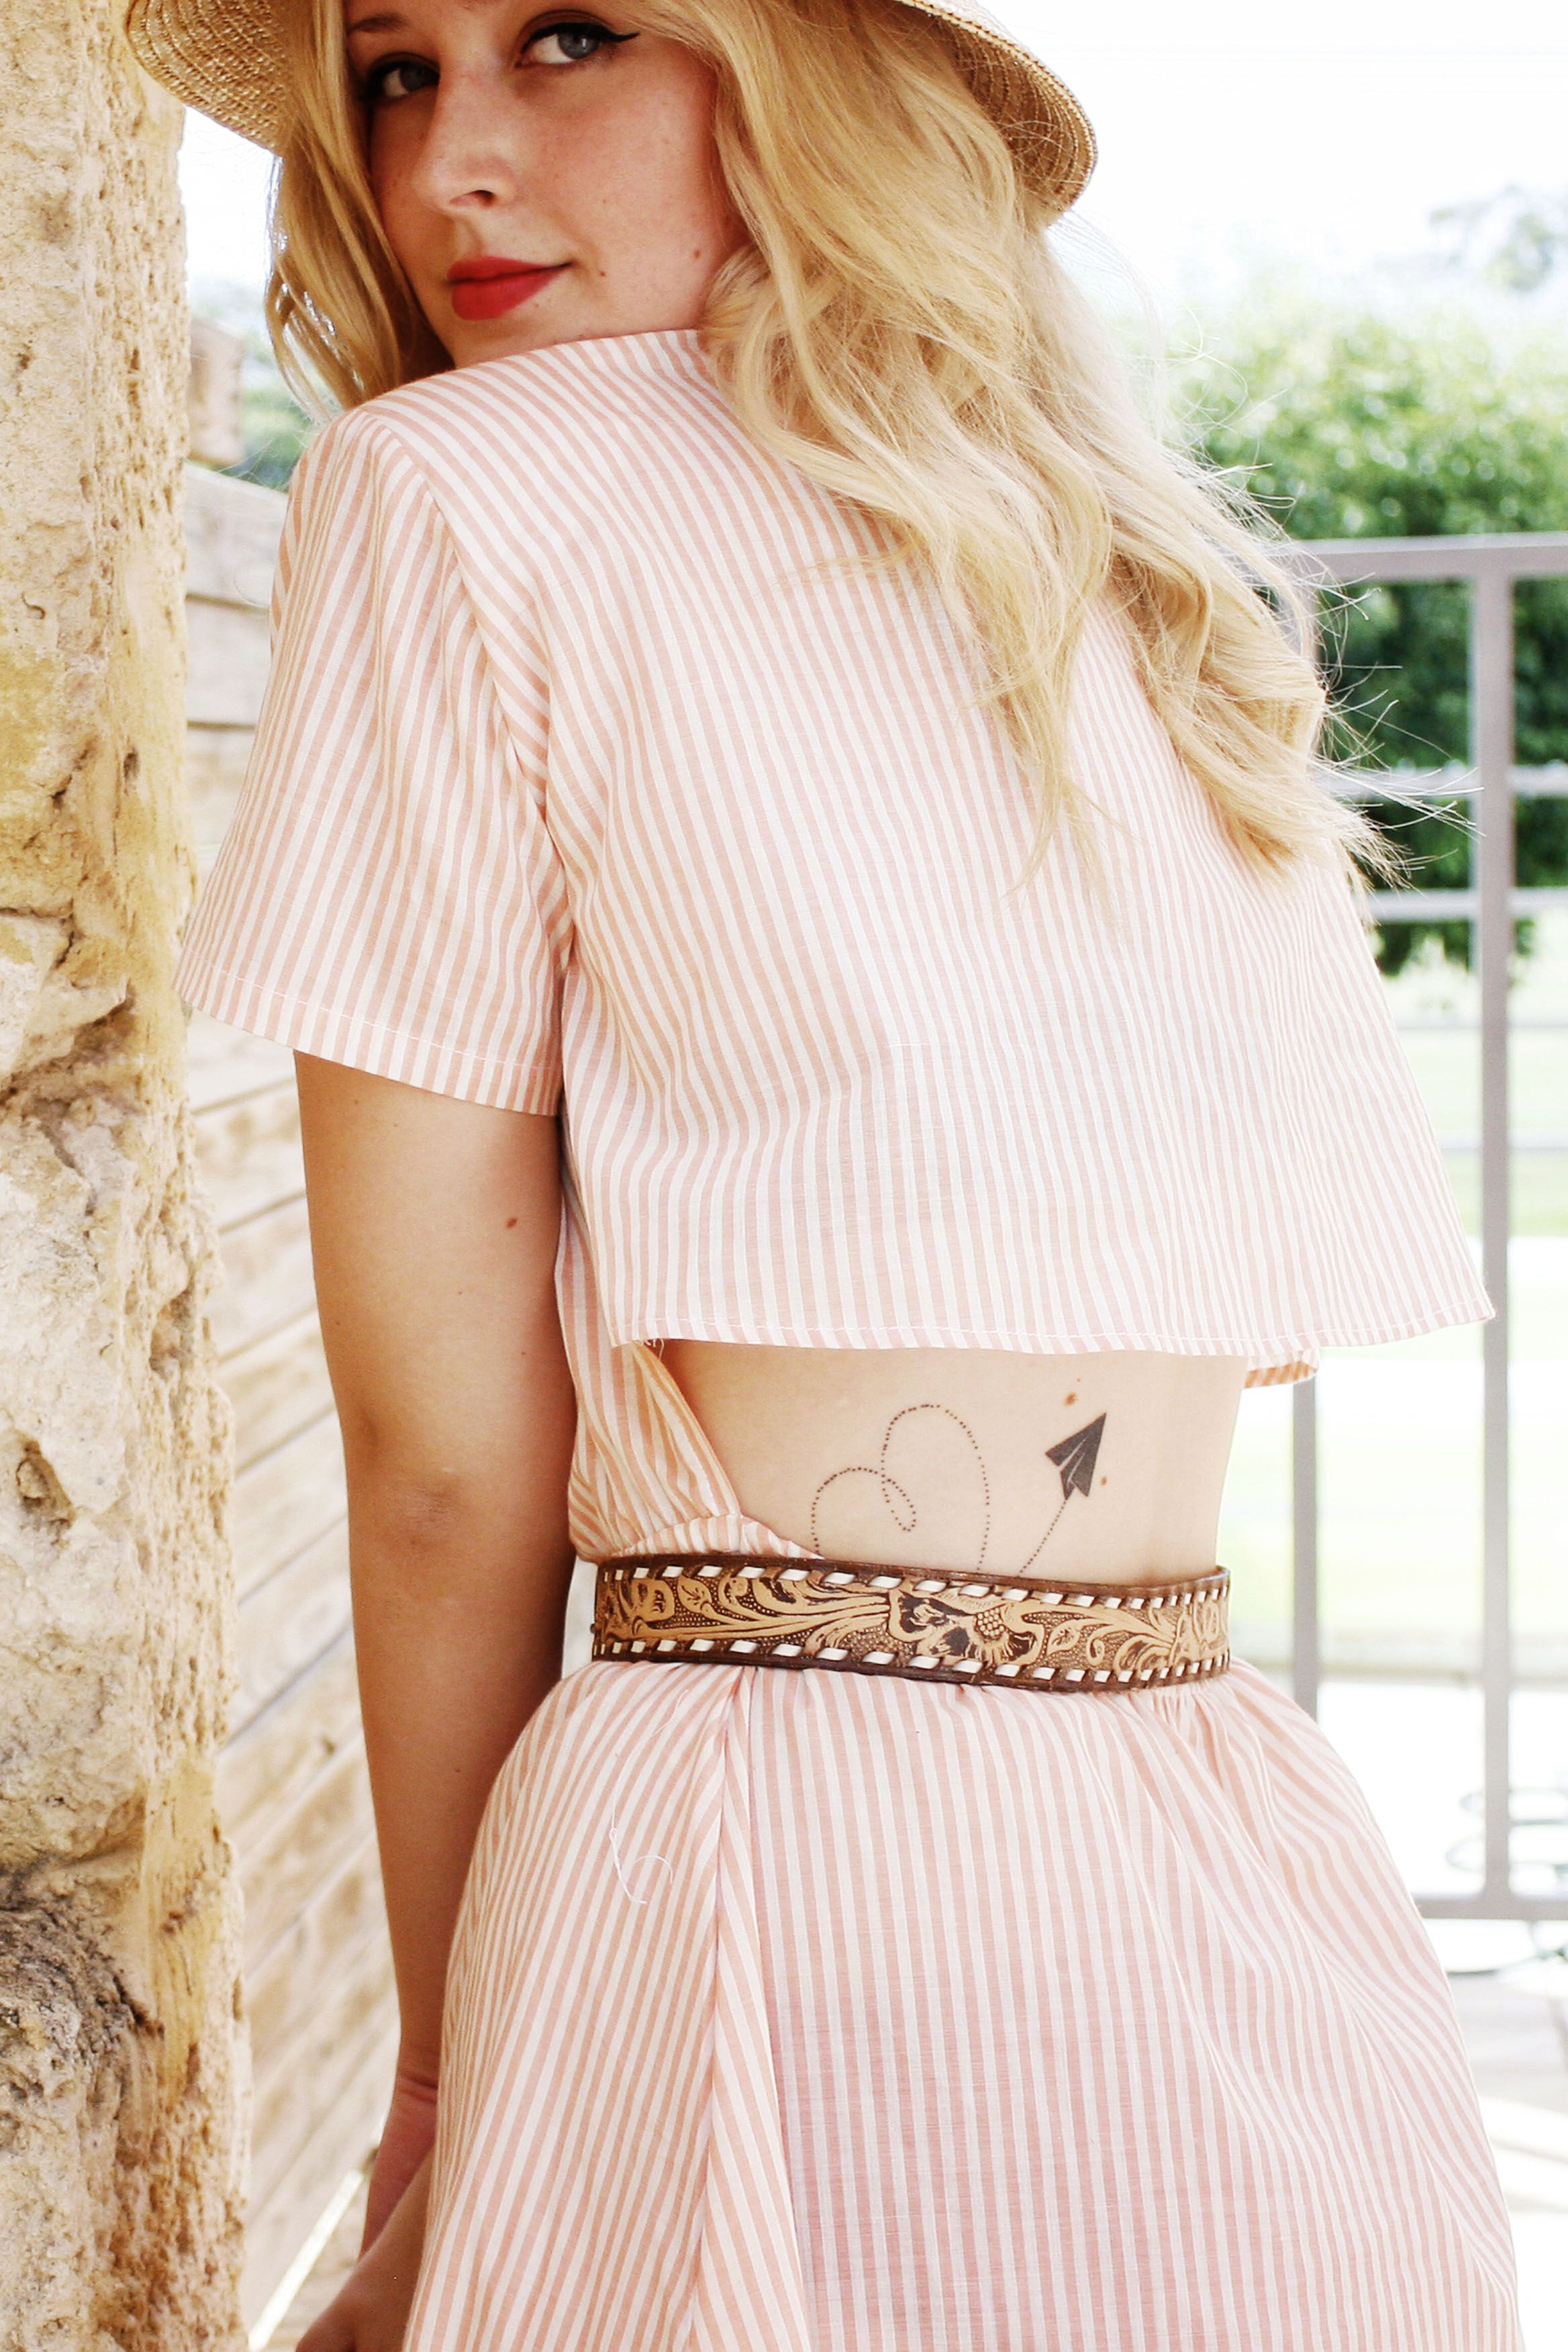 Cute tattoo ideas for lower back avion en papier vol  tattoo  pinterest  tattoo paper plane